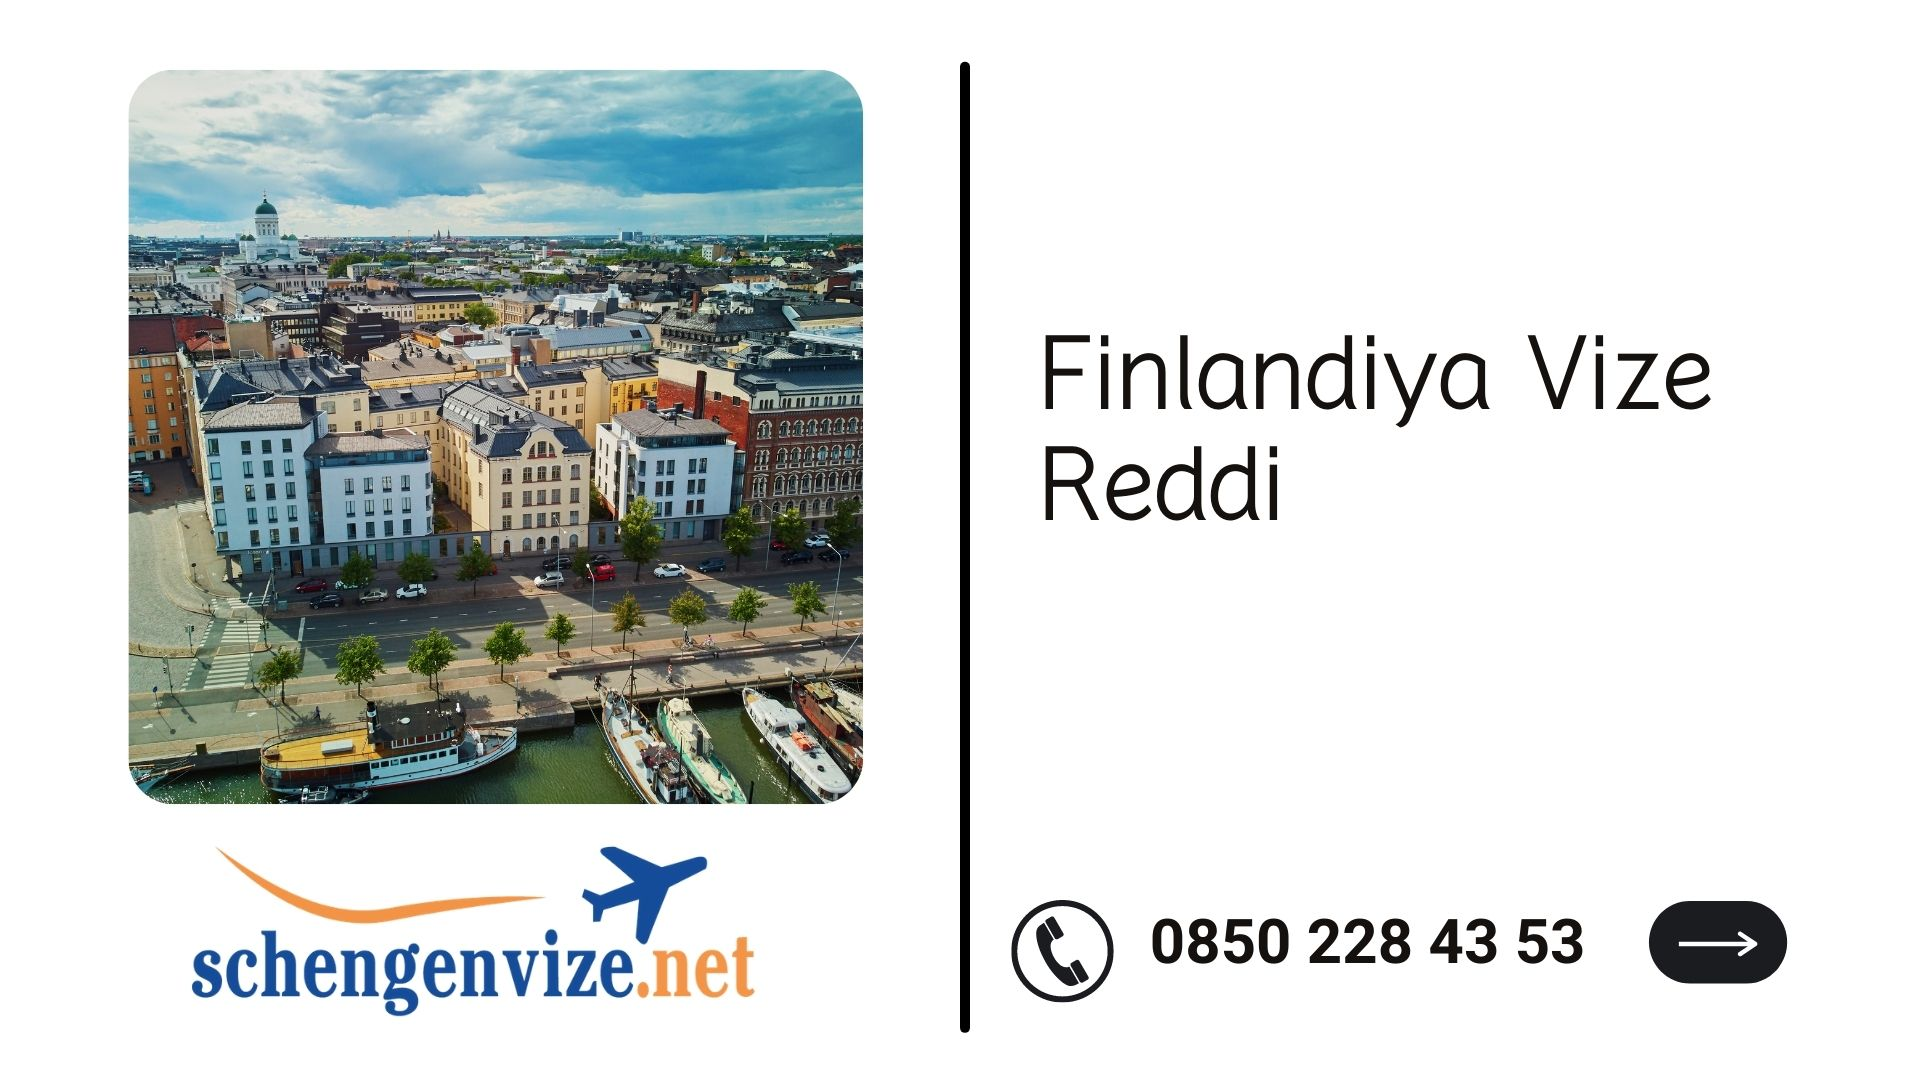 Finlandiya Vize Reddi